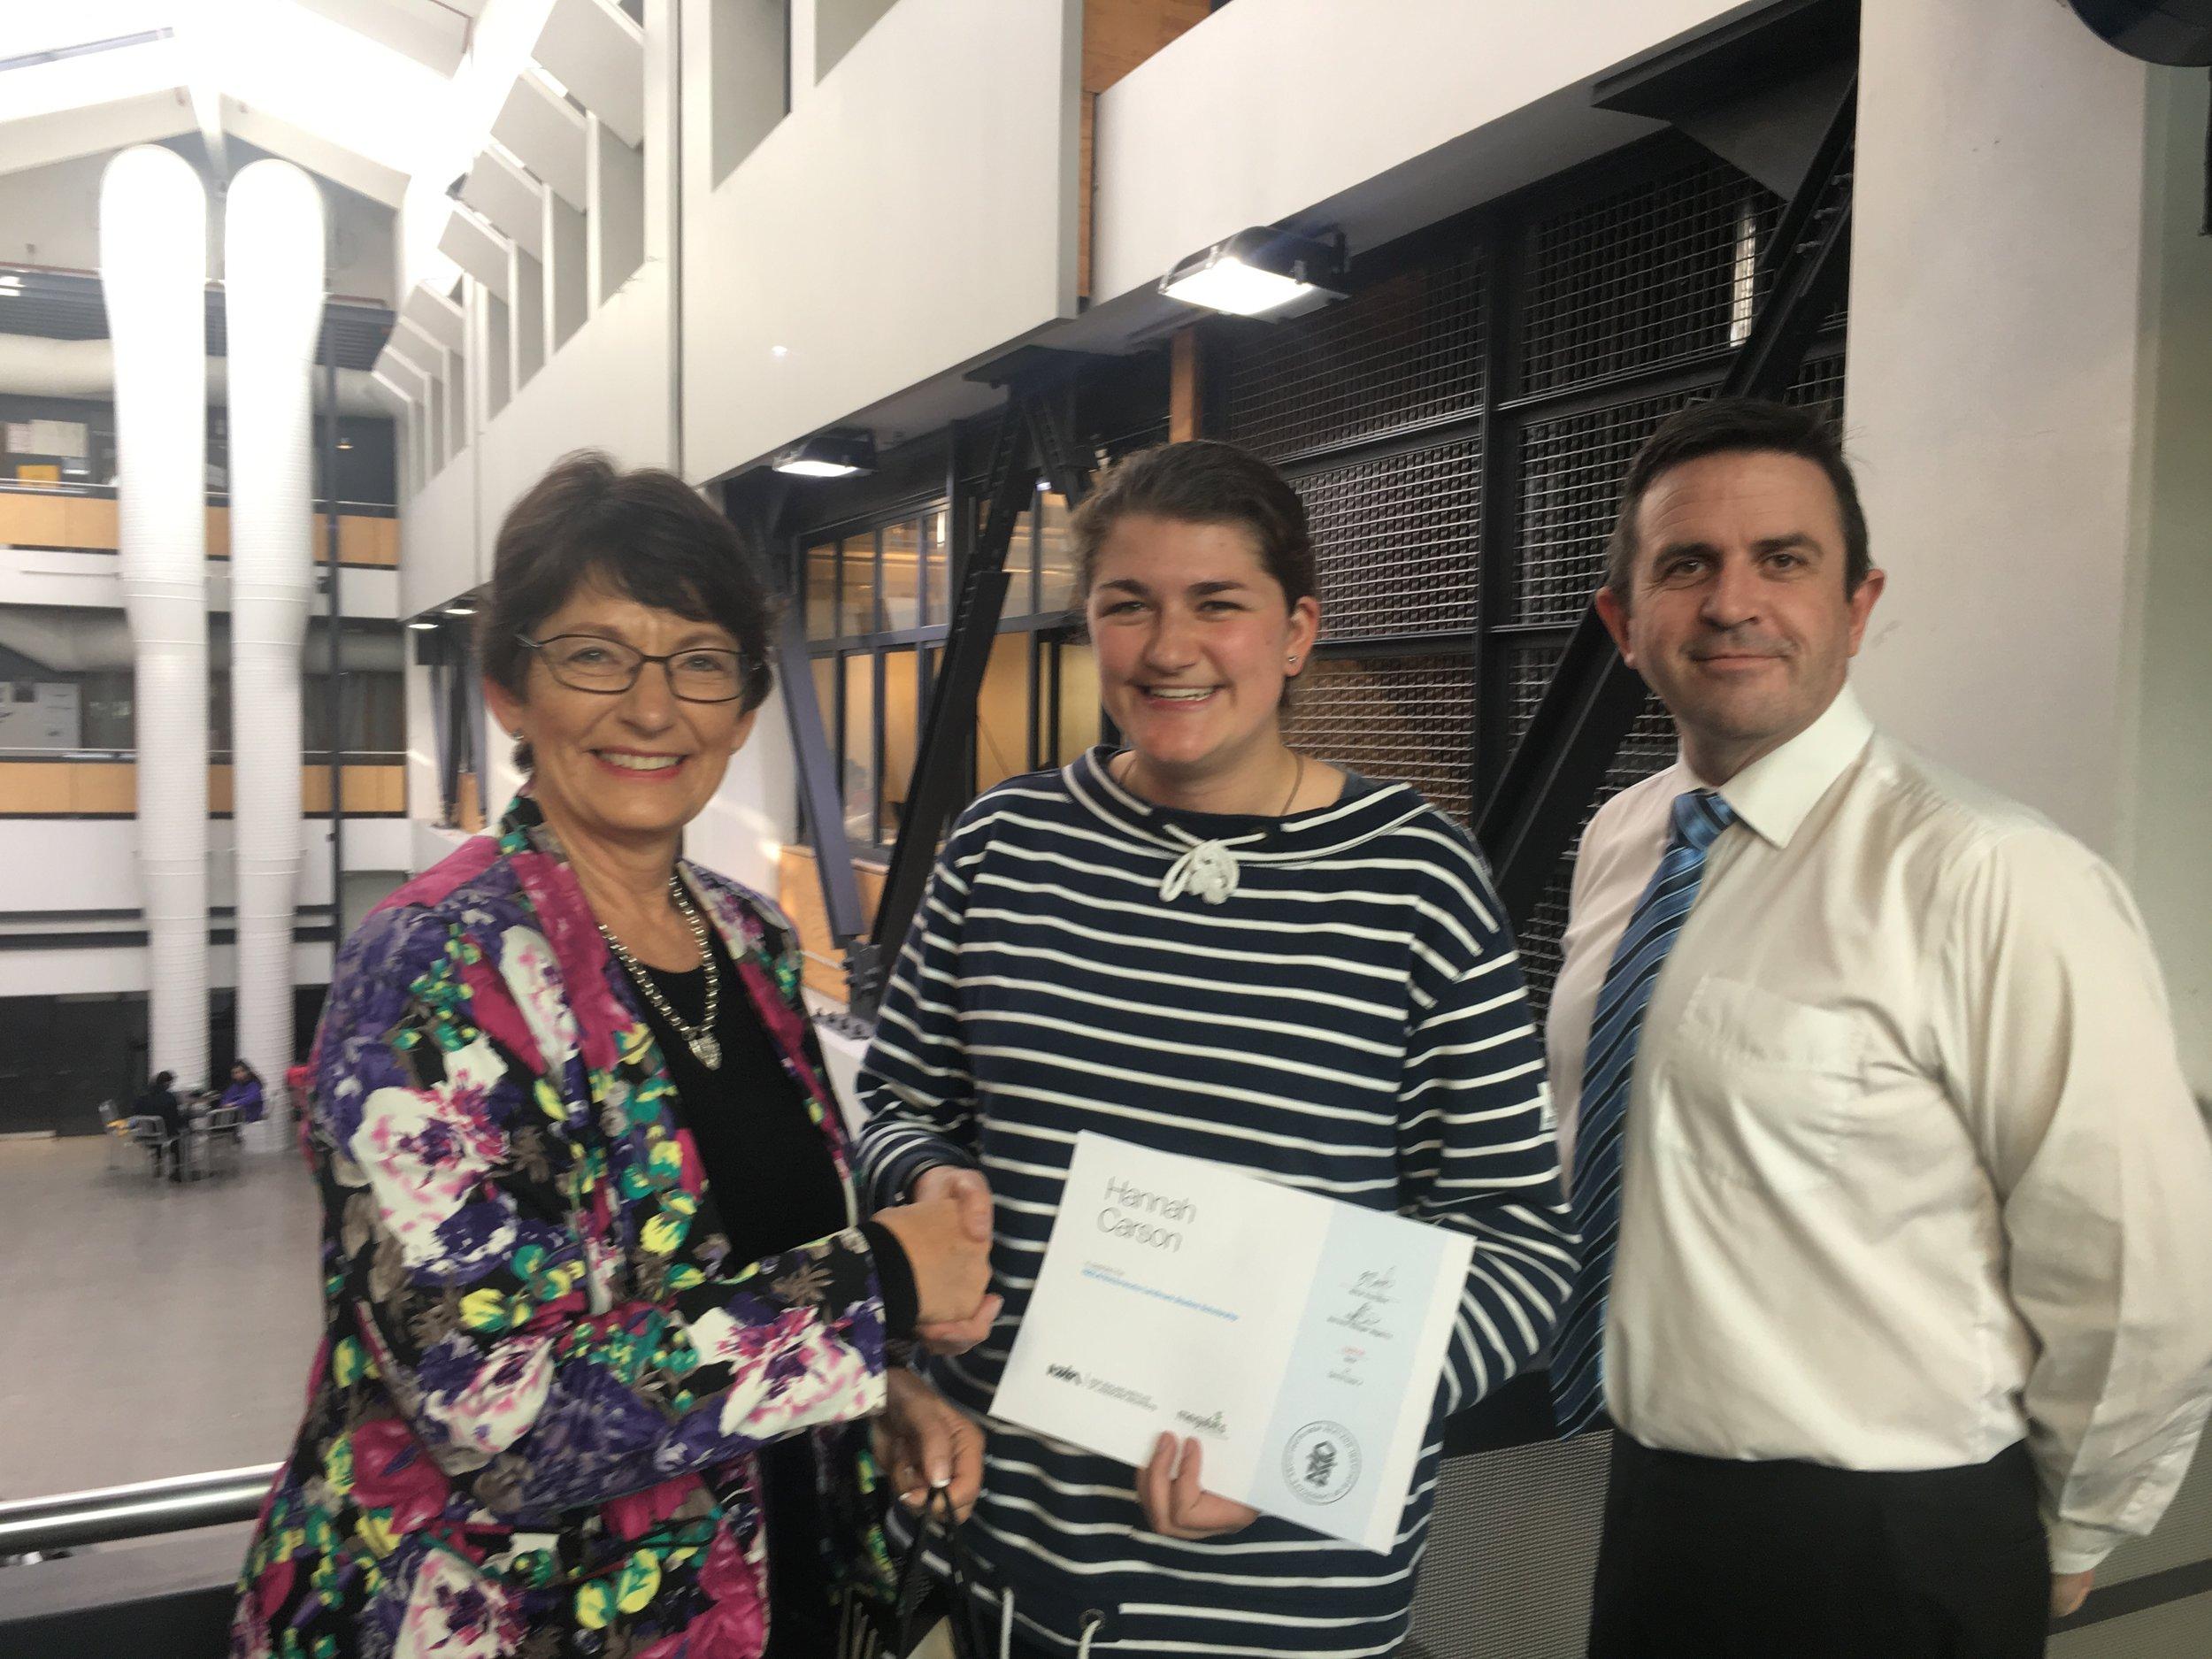 Marilyn Best from Megabits and Michael Wright (NZILA Wellington Branch Secretary)present Hannah Carson with her award.